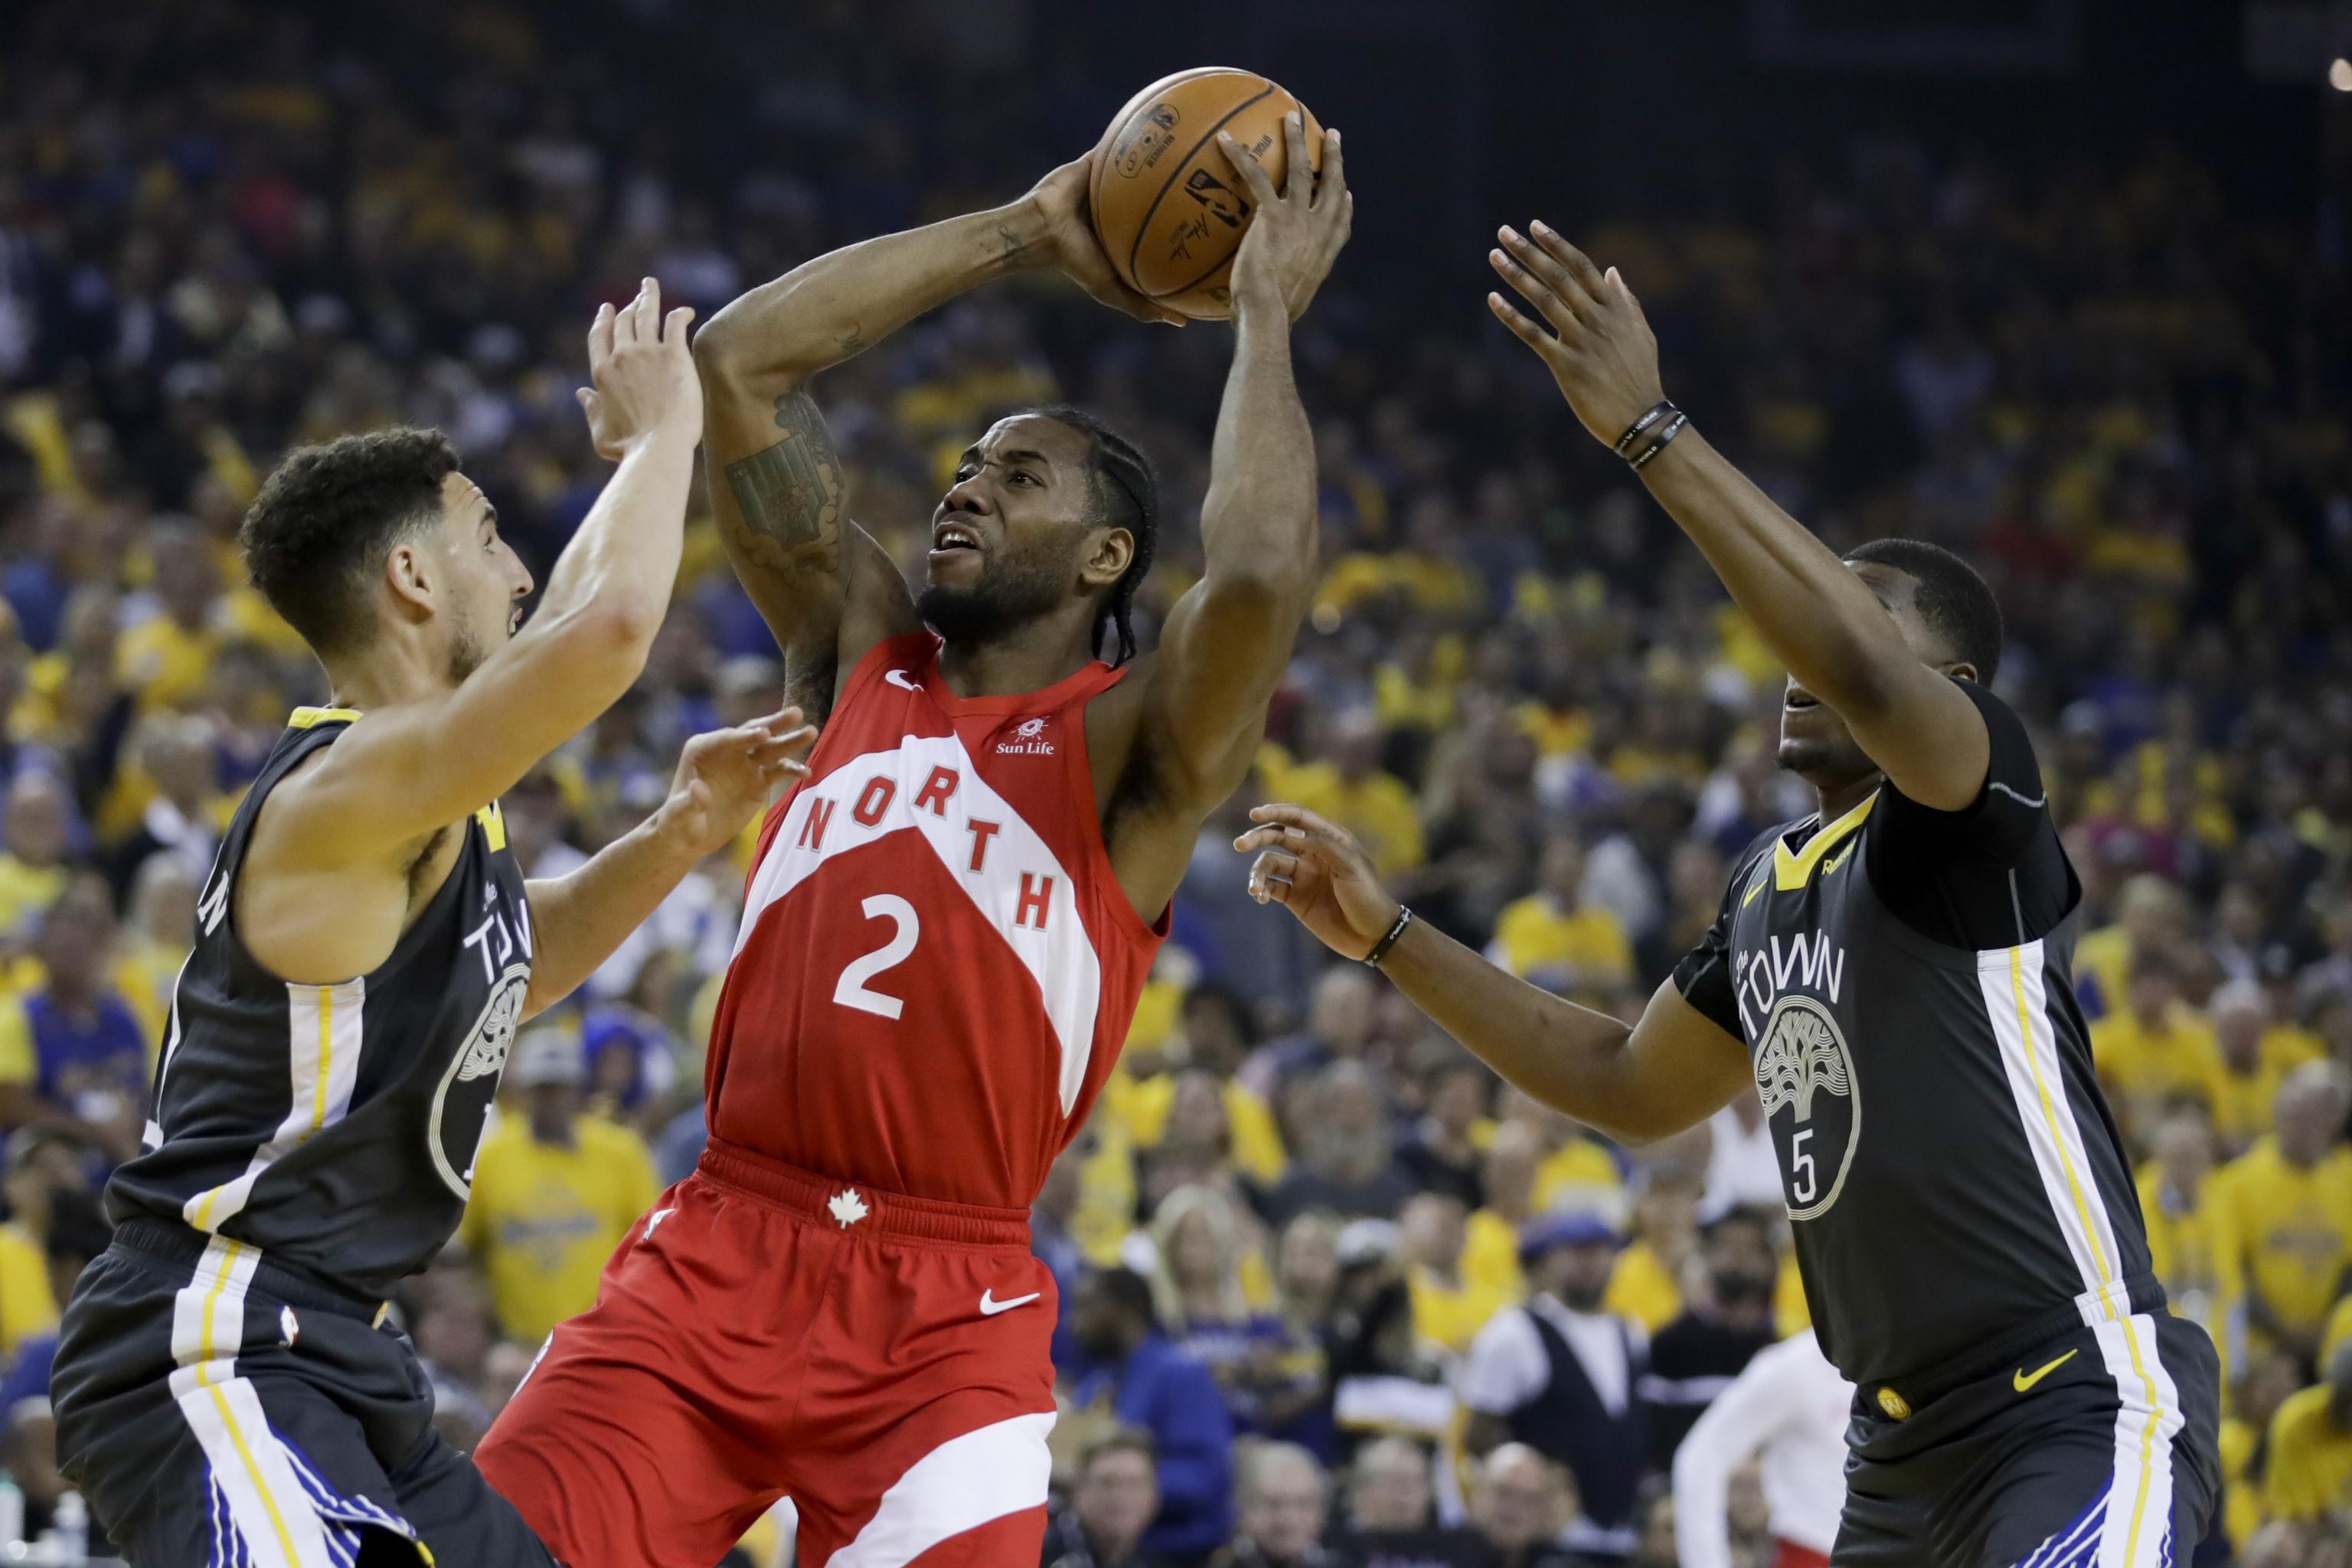 Nba Finals 2019 Game 5 Tv Schedule Warriors Vs Raptors Predictions Bleacher Report Latest News Videos And Highlights